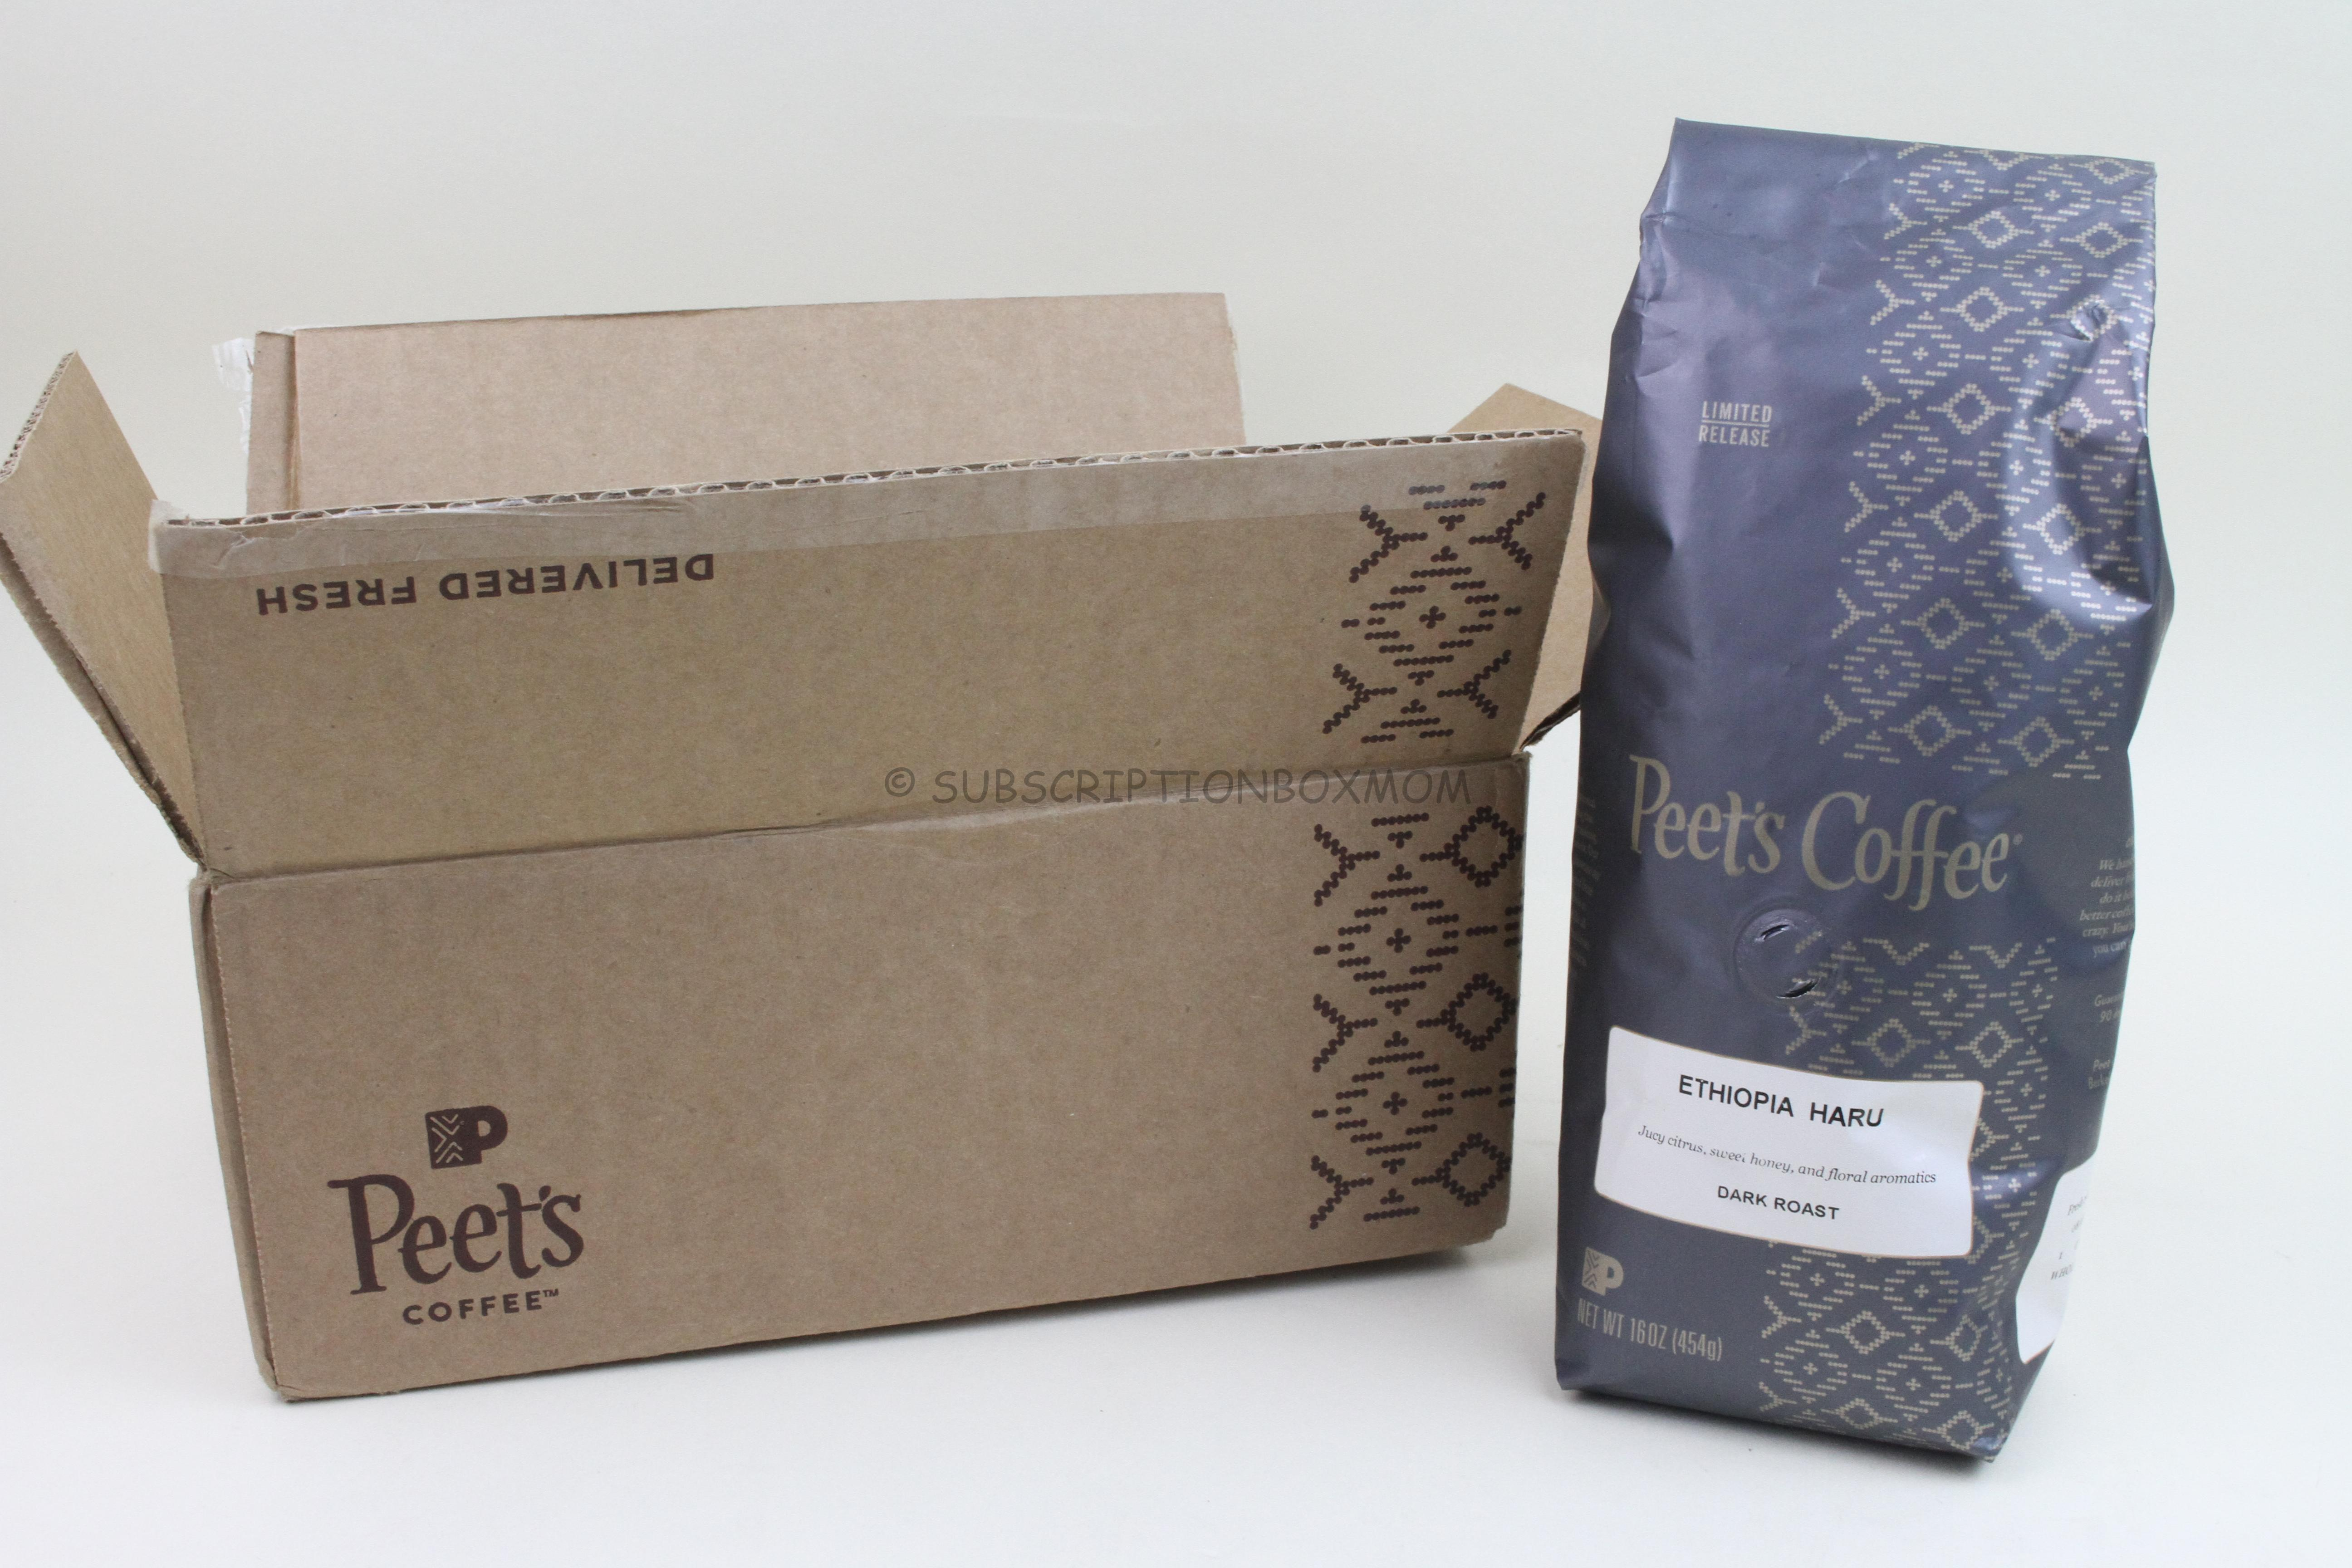 peets coffee coupon january 2019